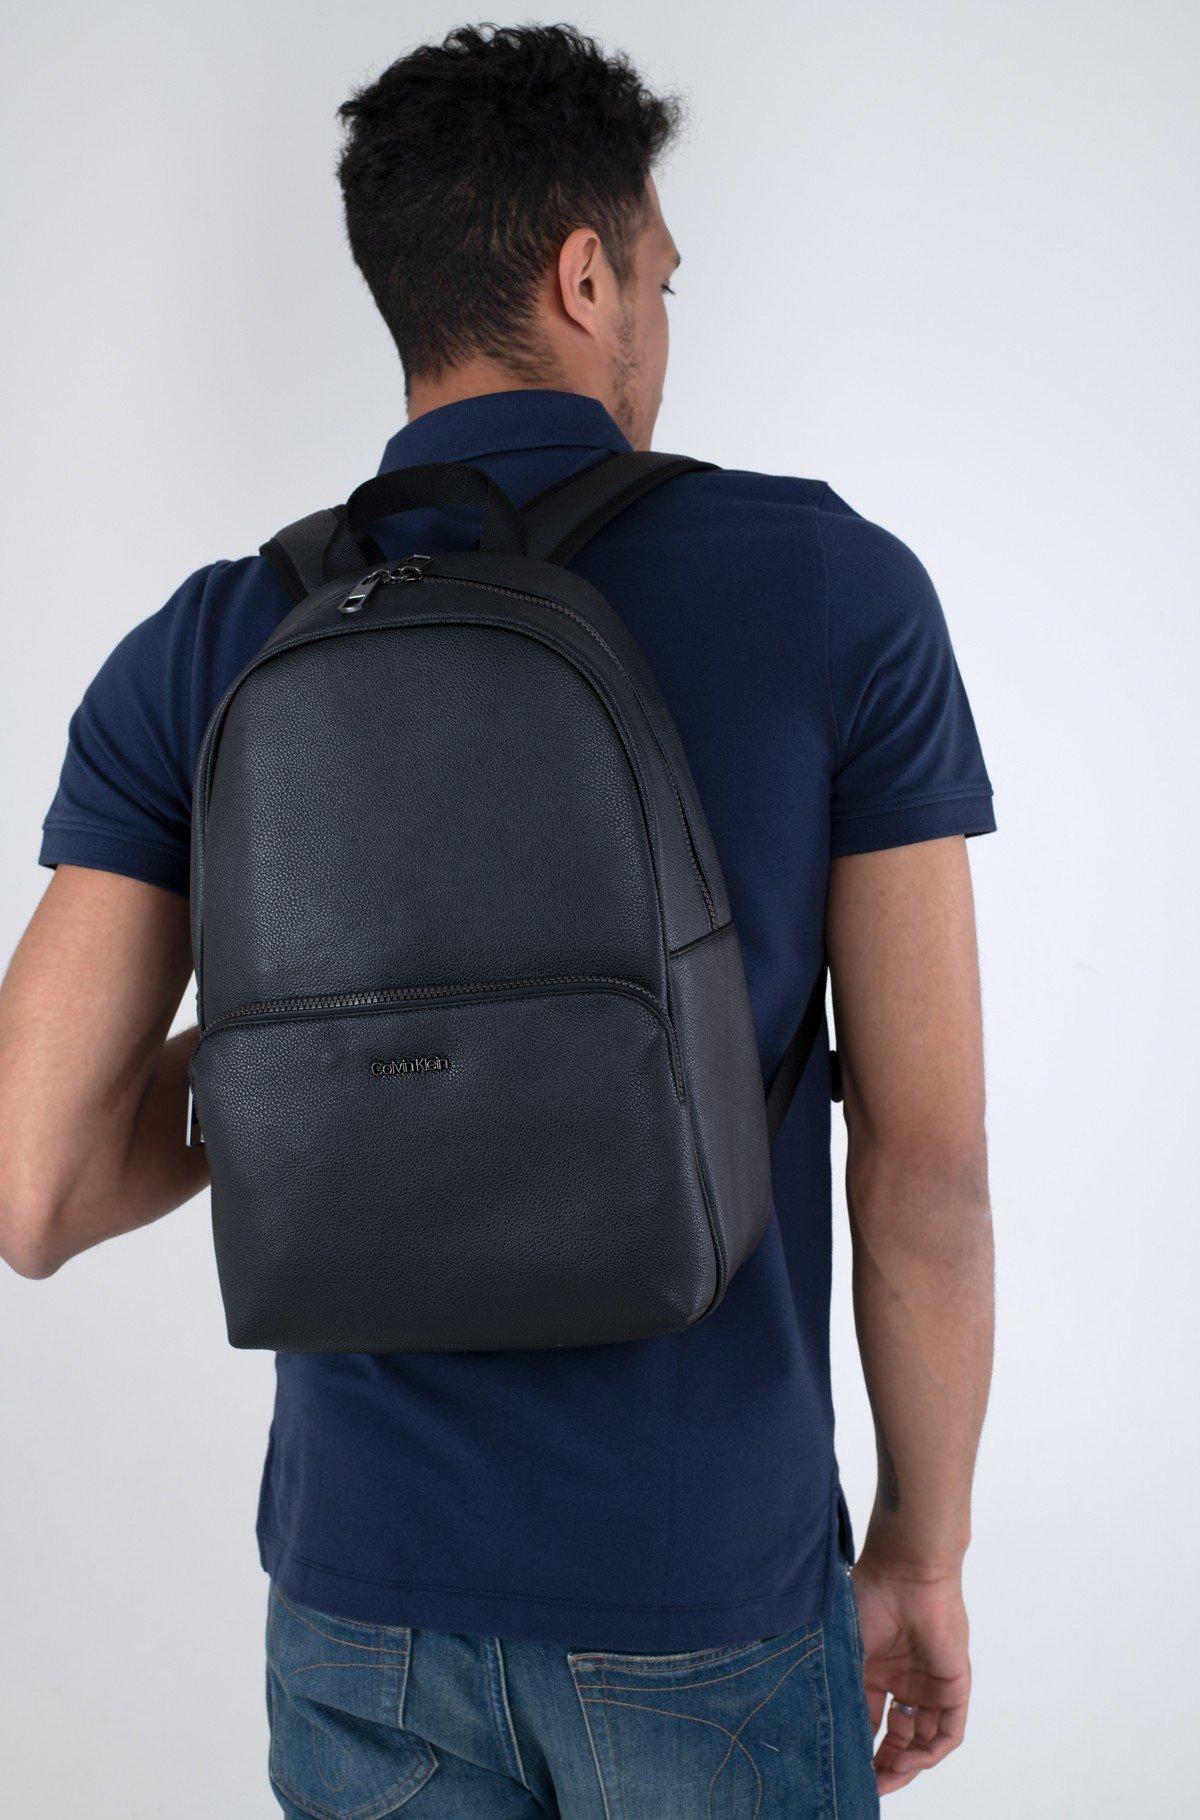 Backbag CAMPUS BP K50K506309-full-1